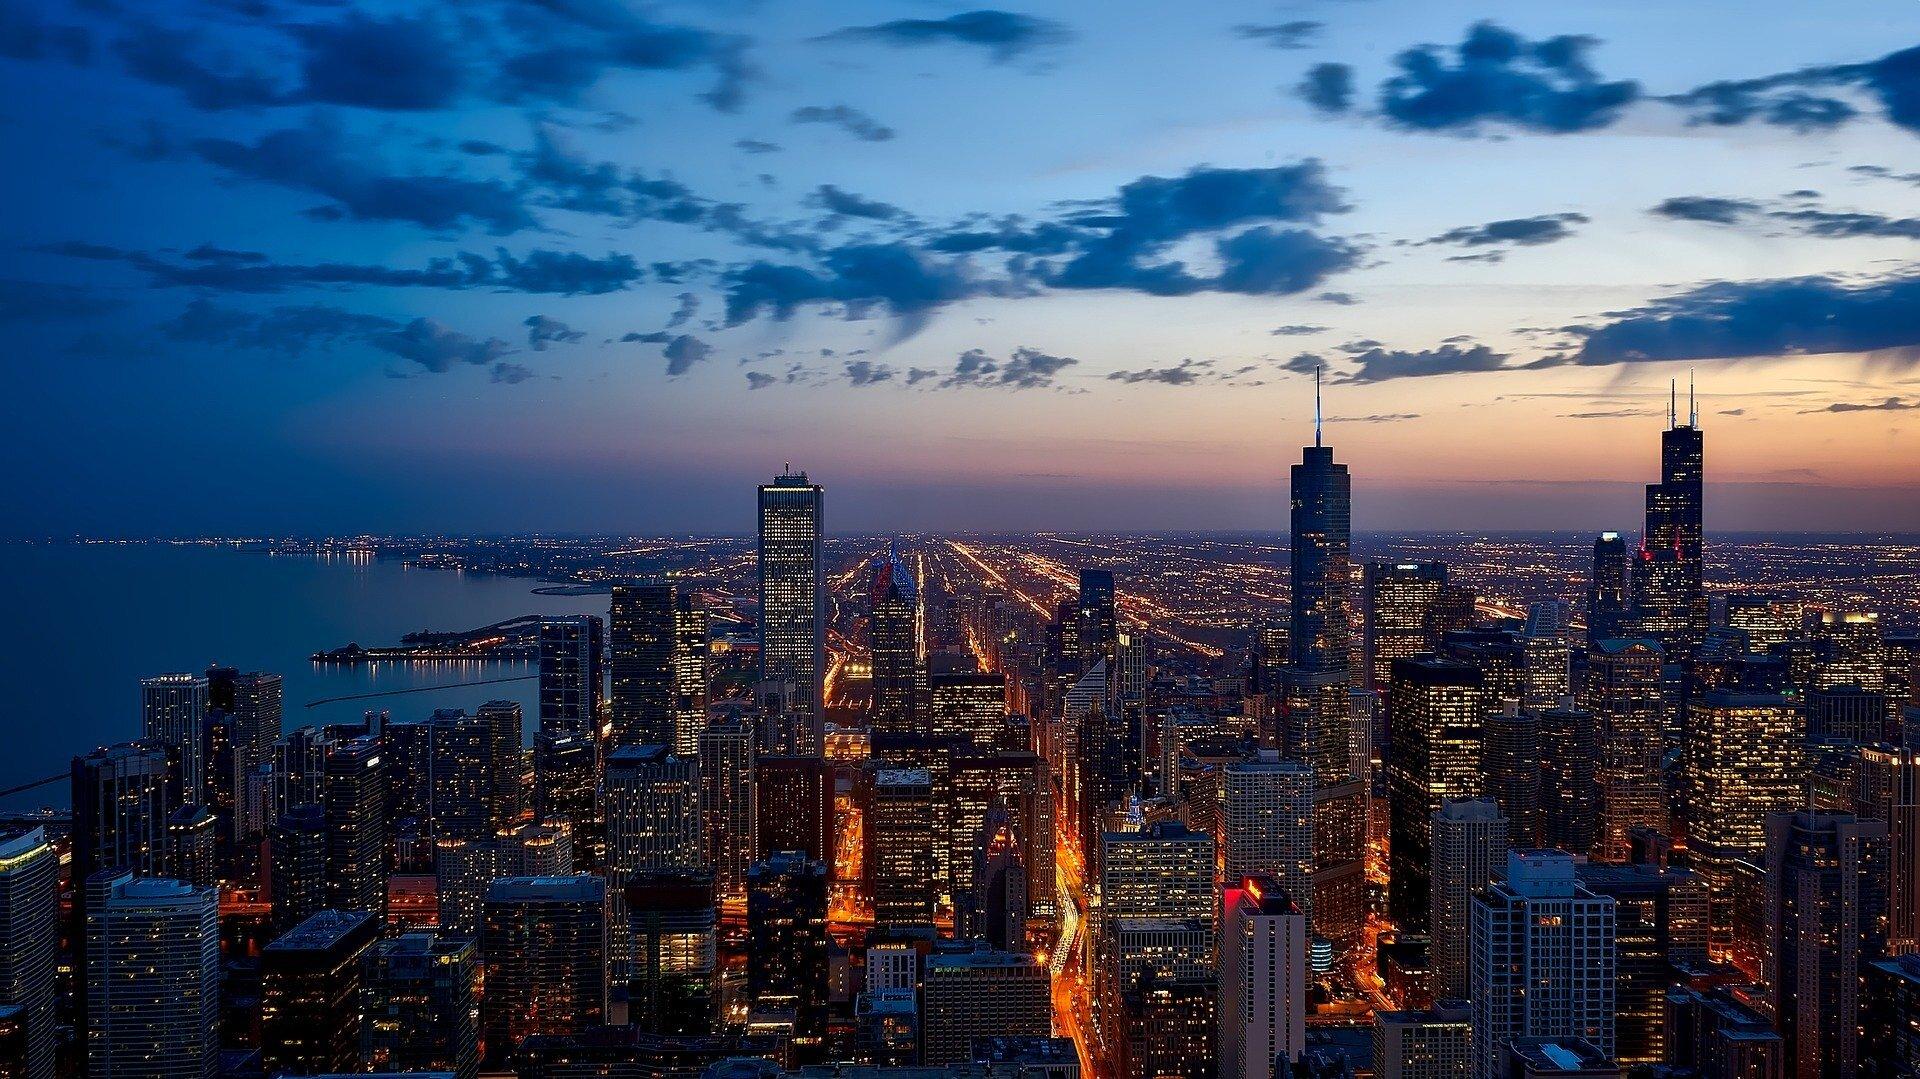 Cities Beat Suburbs at Inspiring Cutting-Edge Innovations